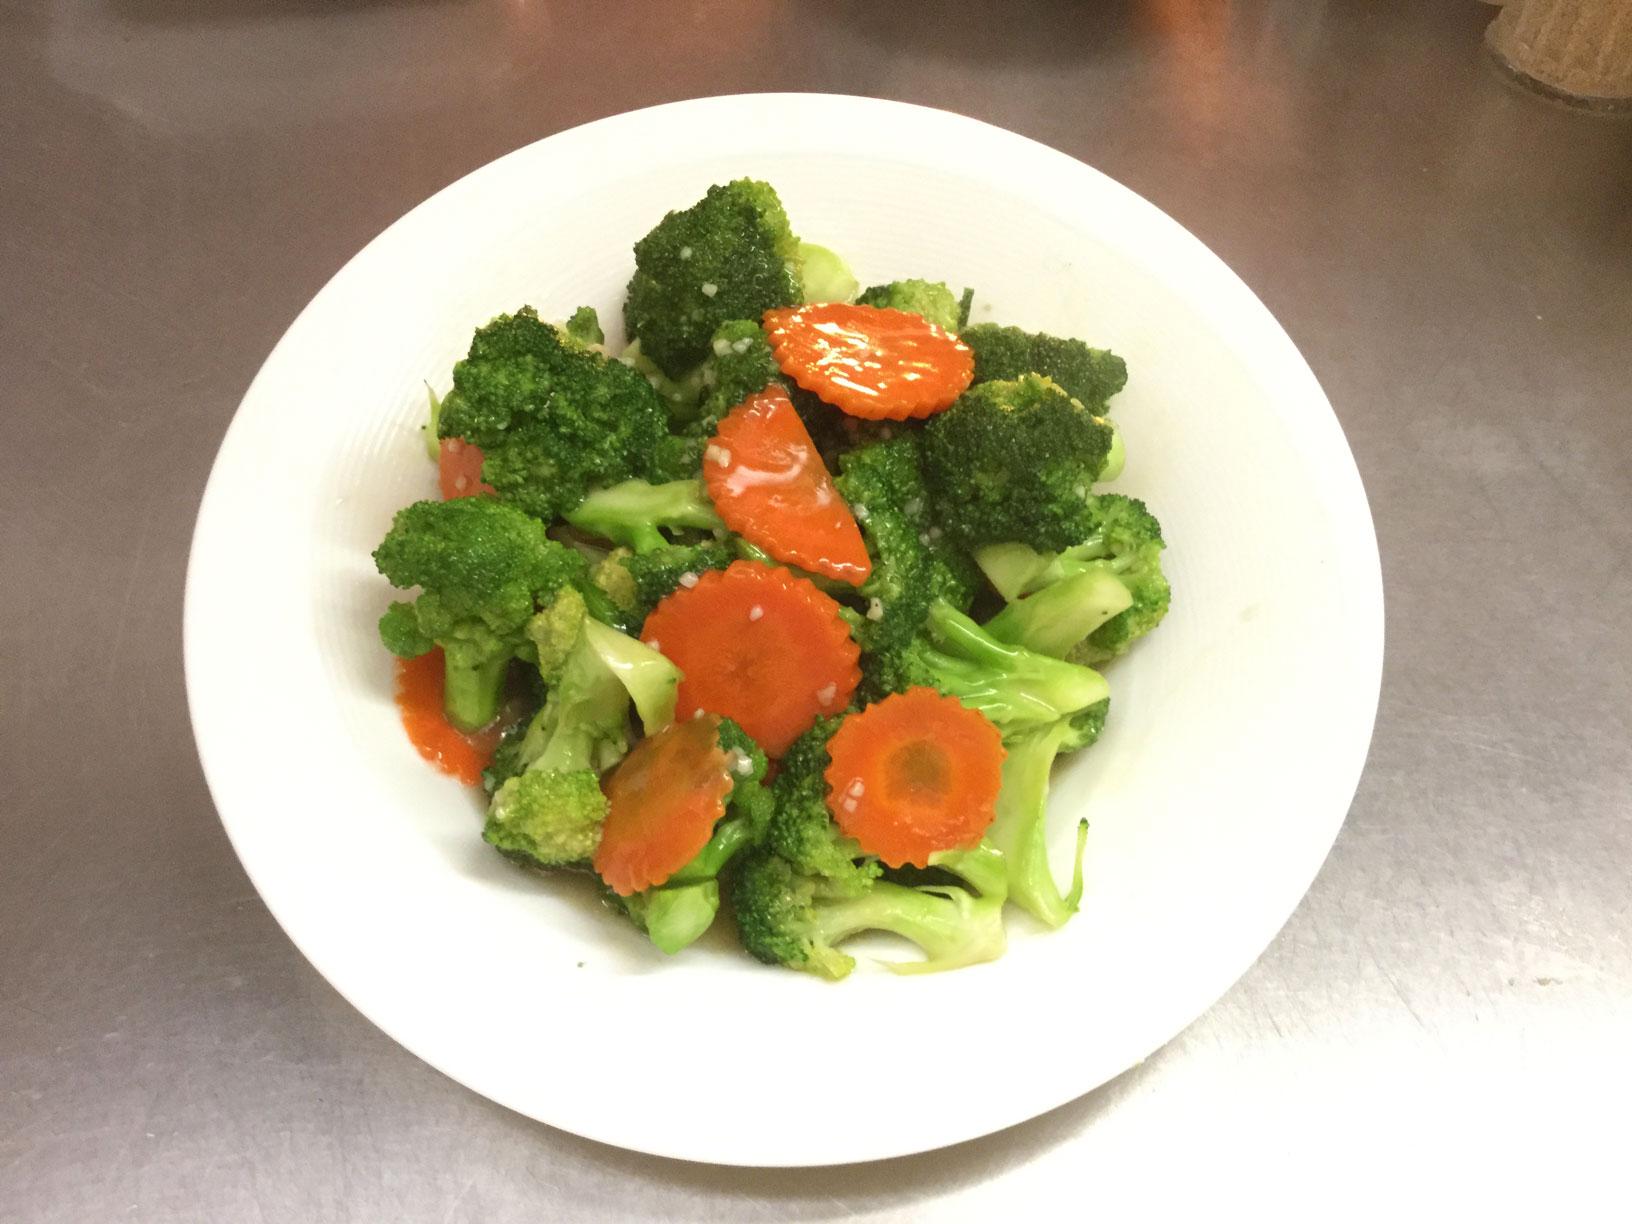 stir fry broccoli and carrots